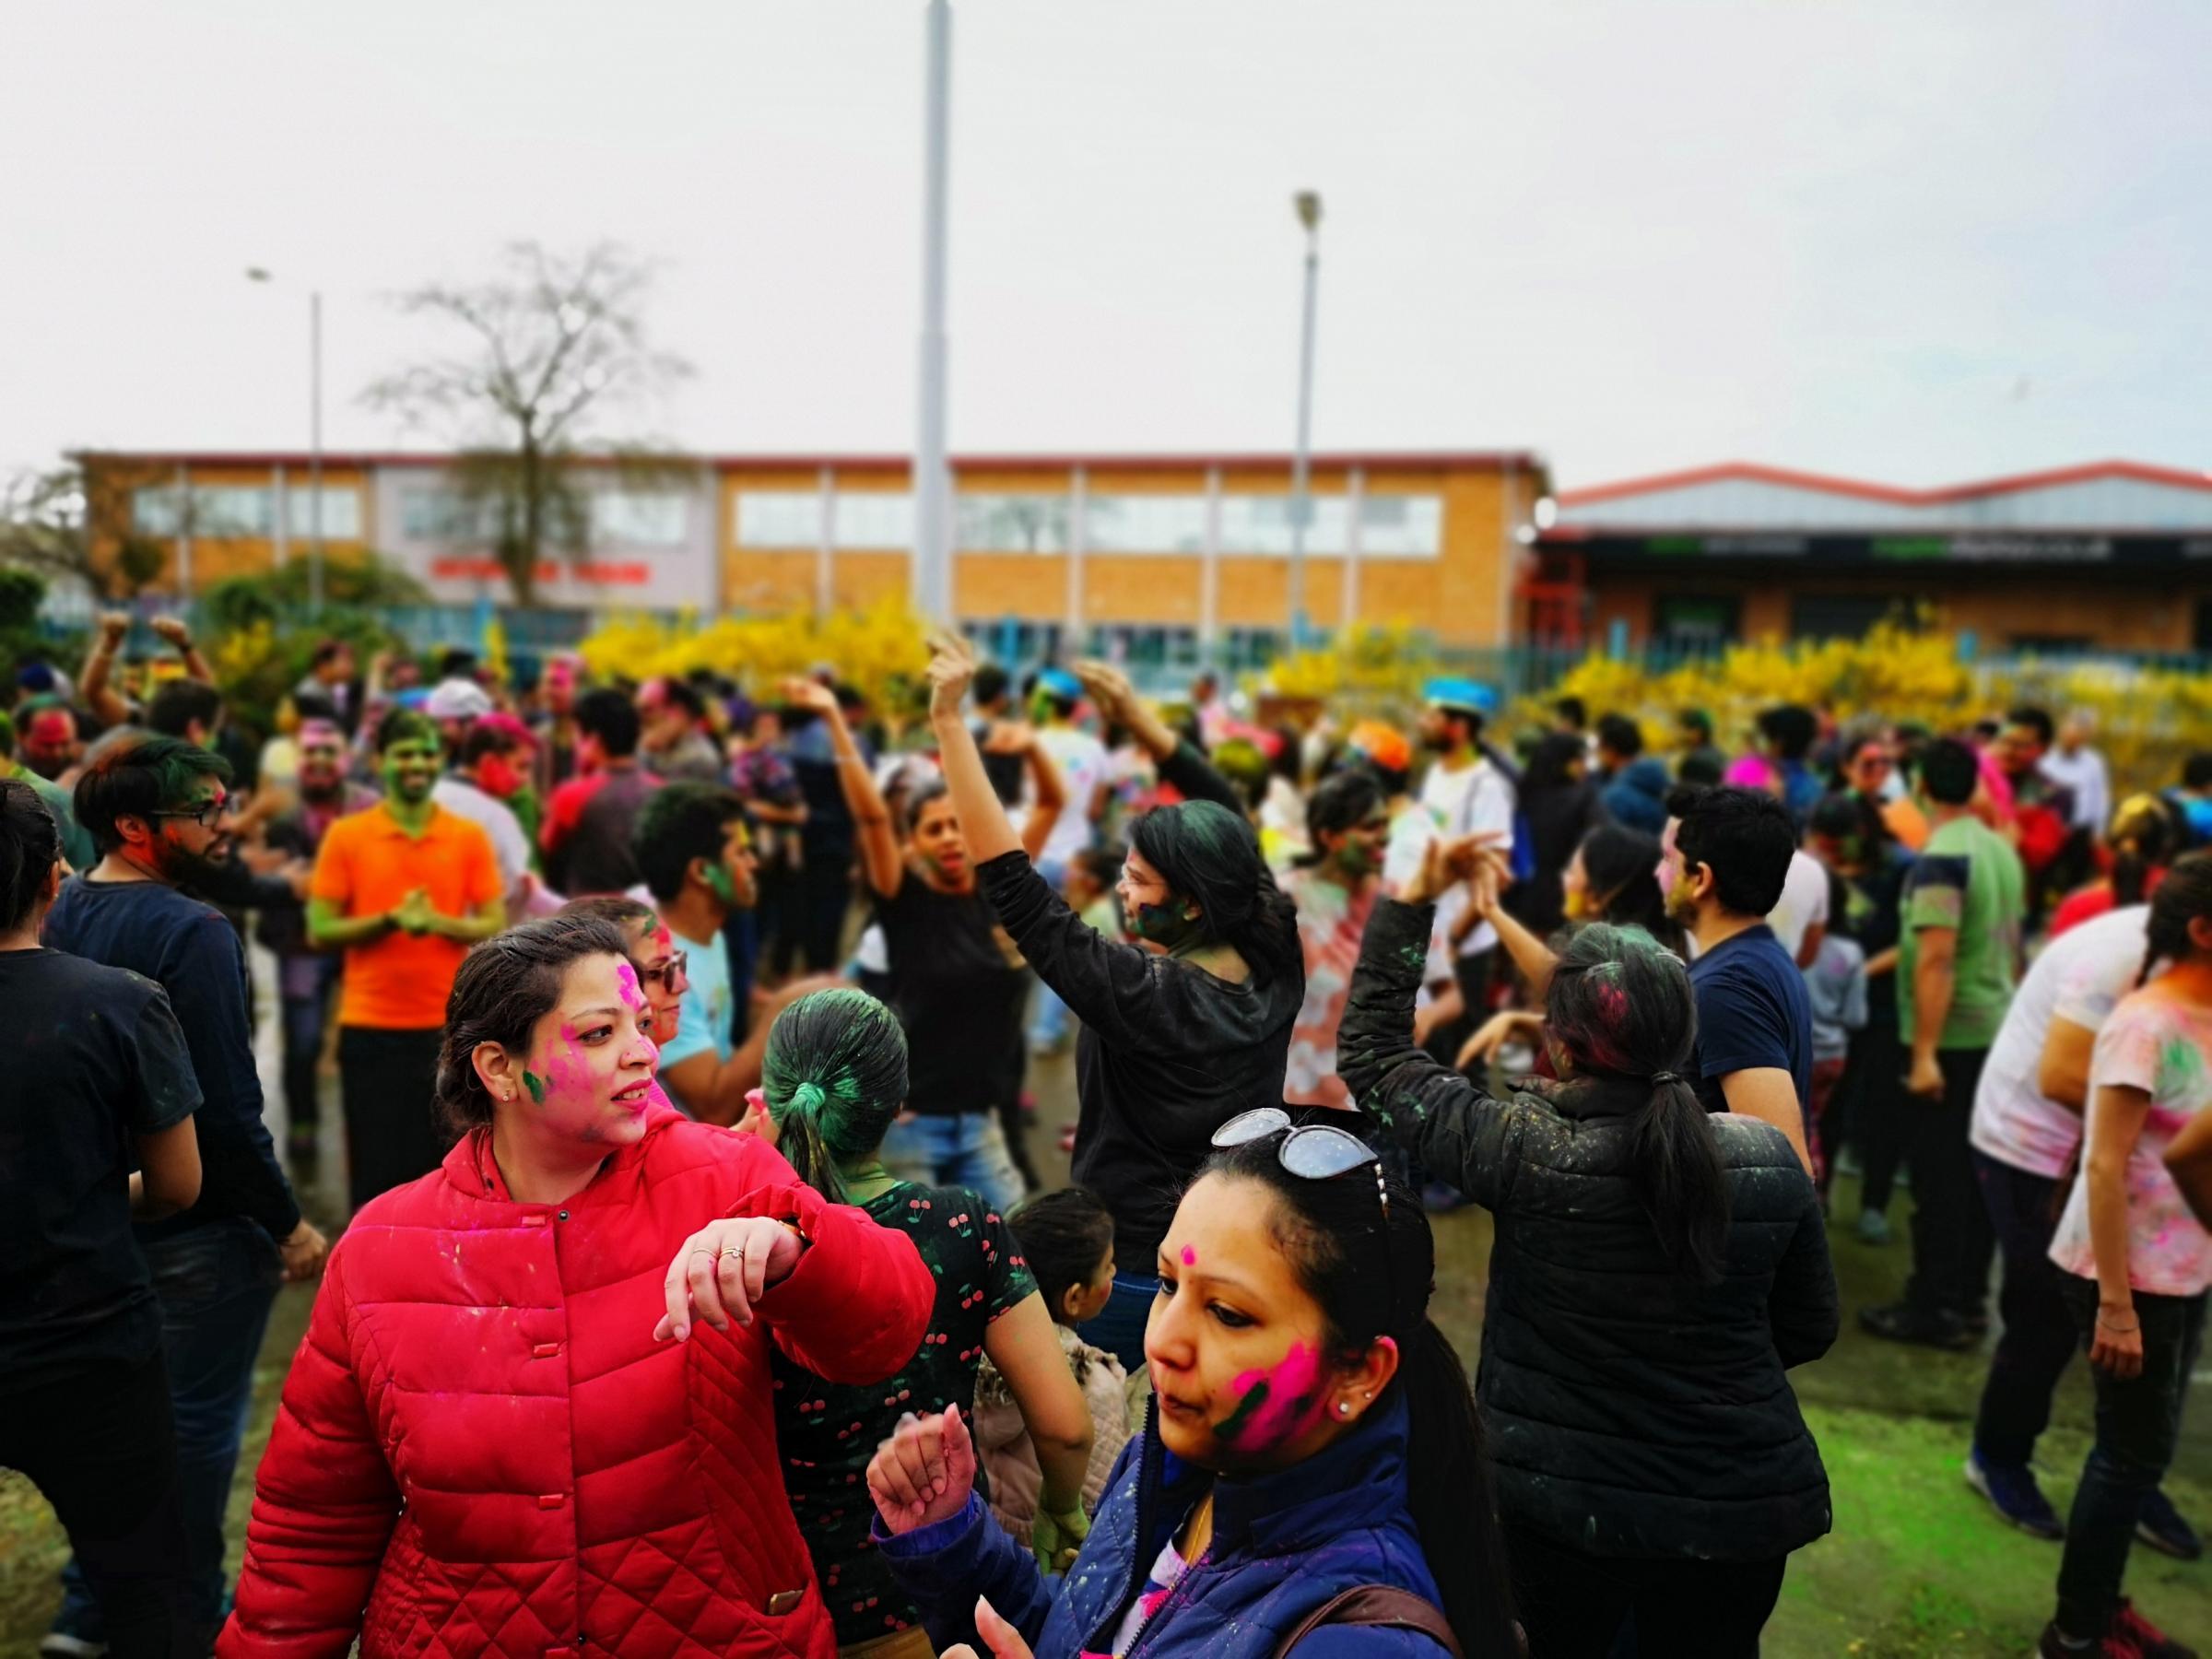 More than 1,000 people enjoy colourful Holi Festival